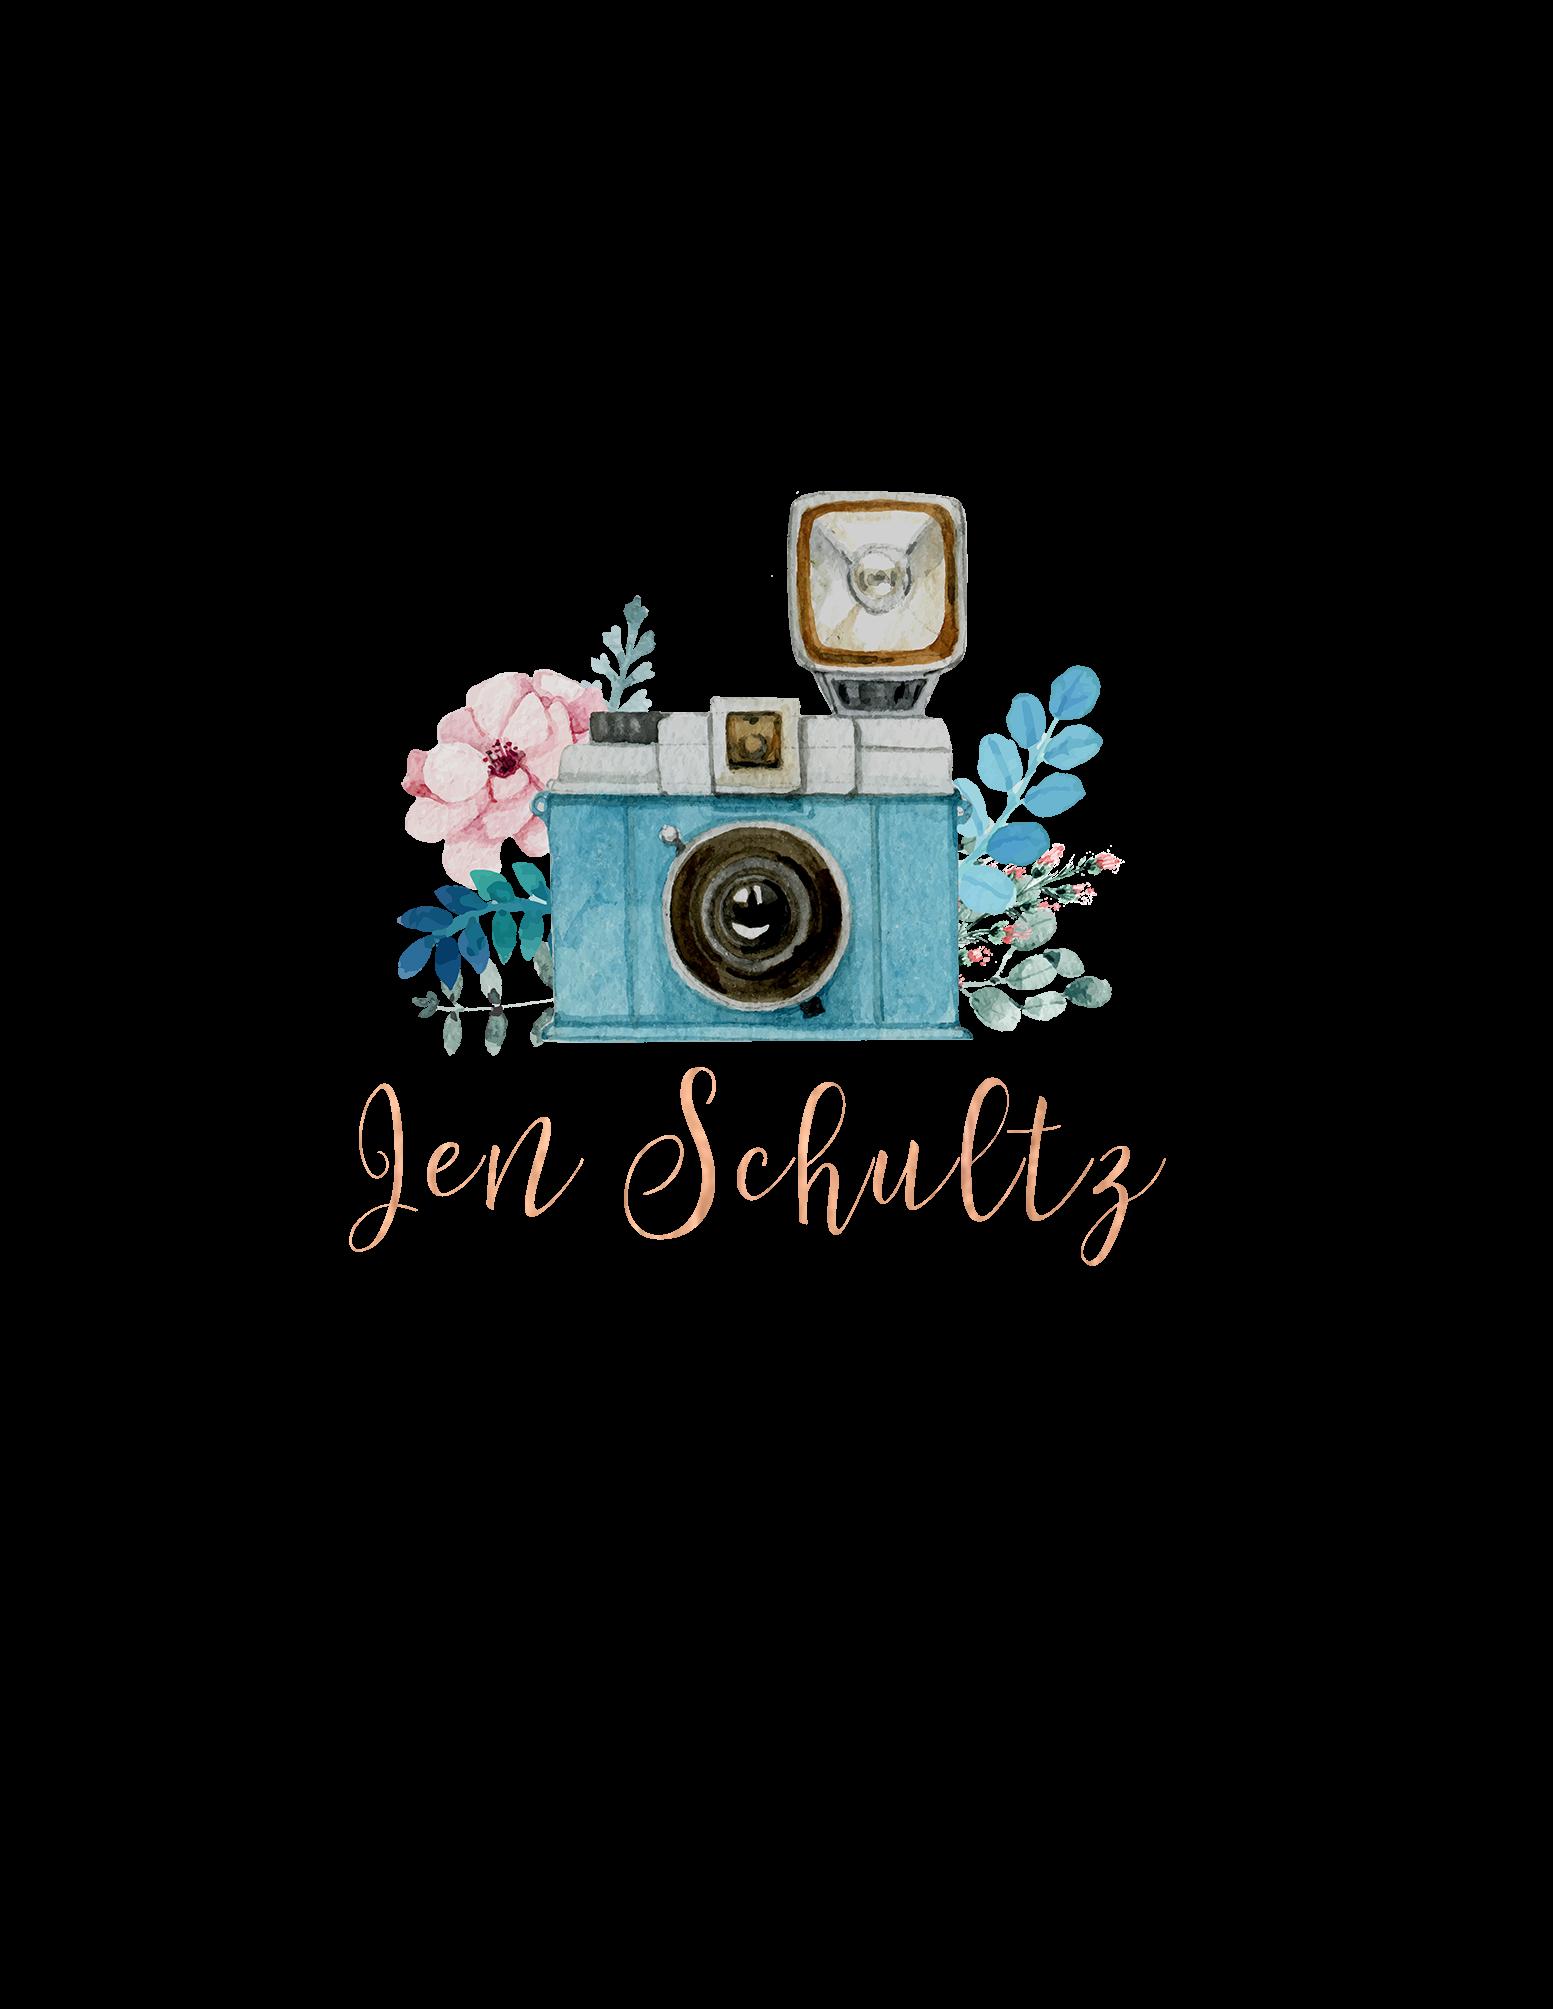 Jen Schultz Photography